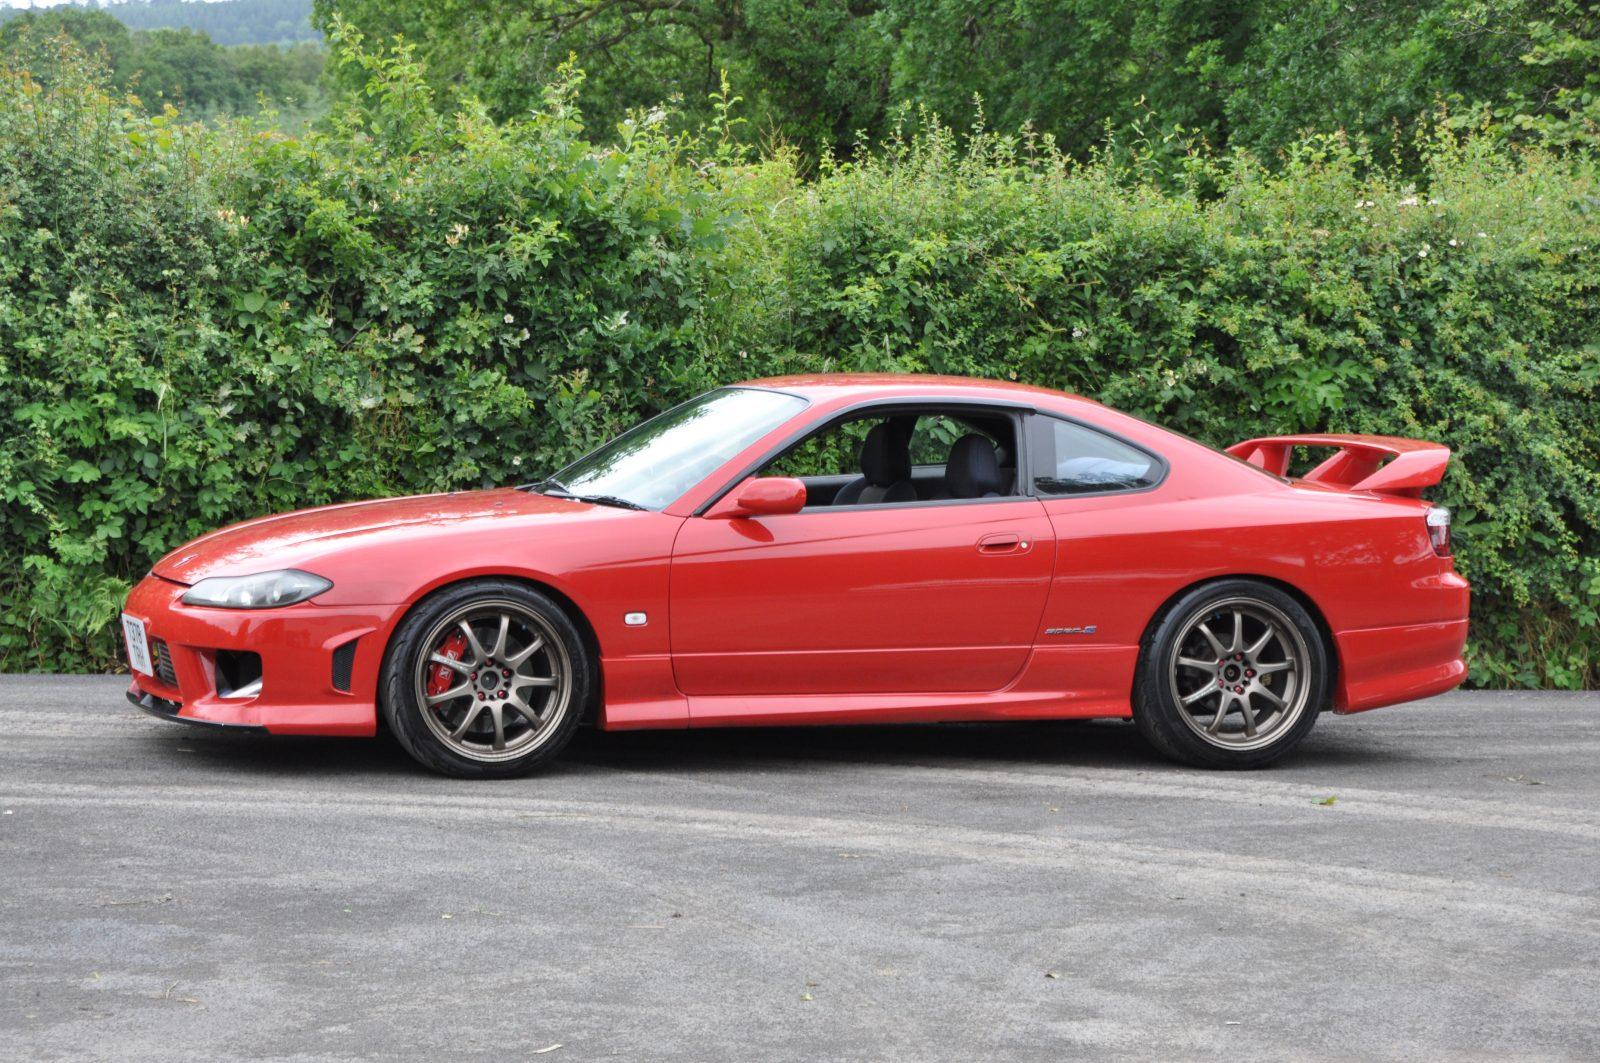 Nissan Silvia S15 For Sale Usa >> Nissan Silvia S15 - Jap Imports UK